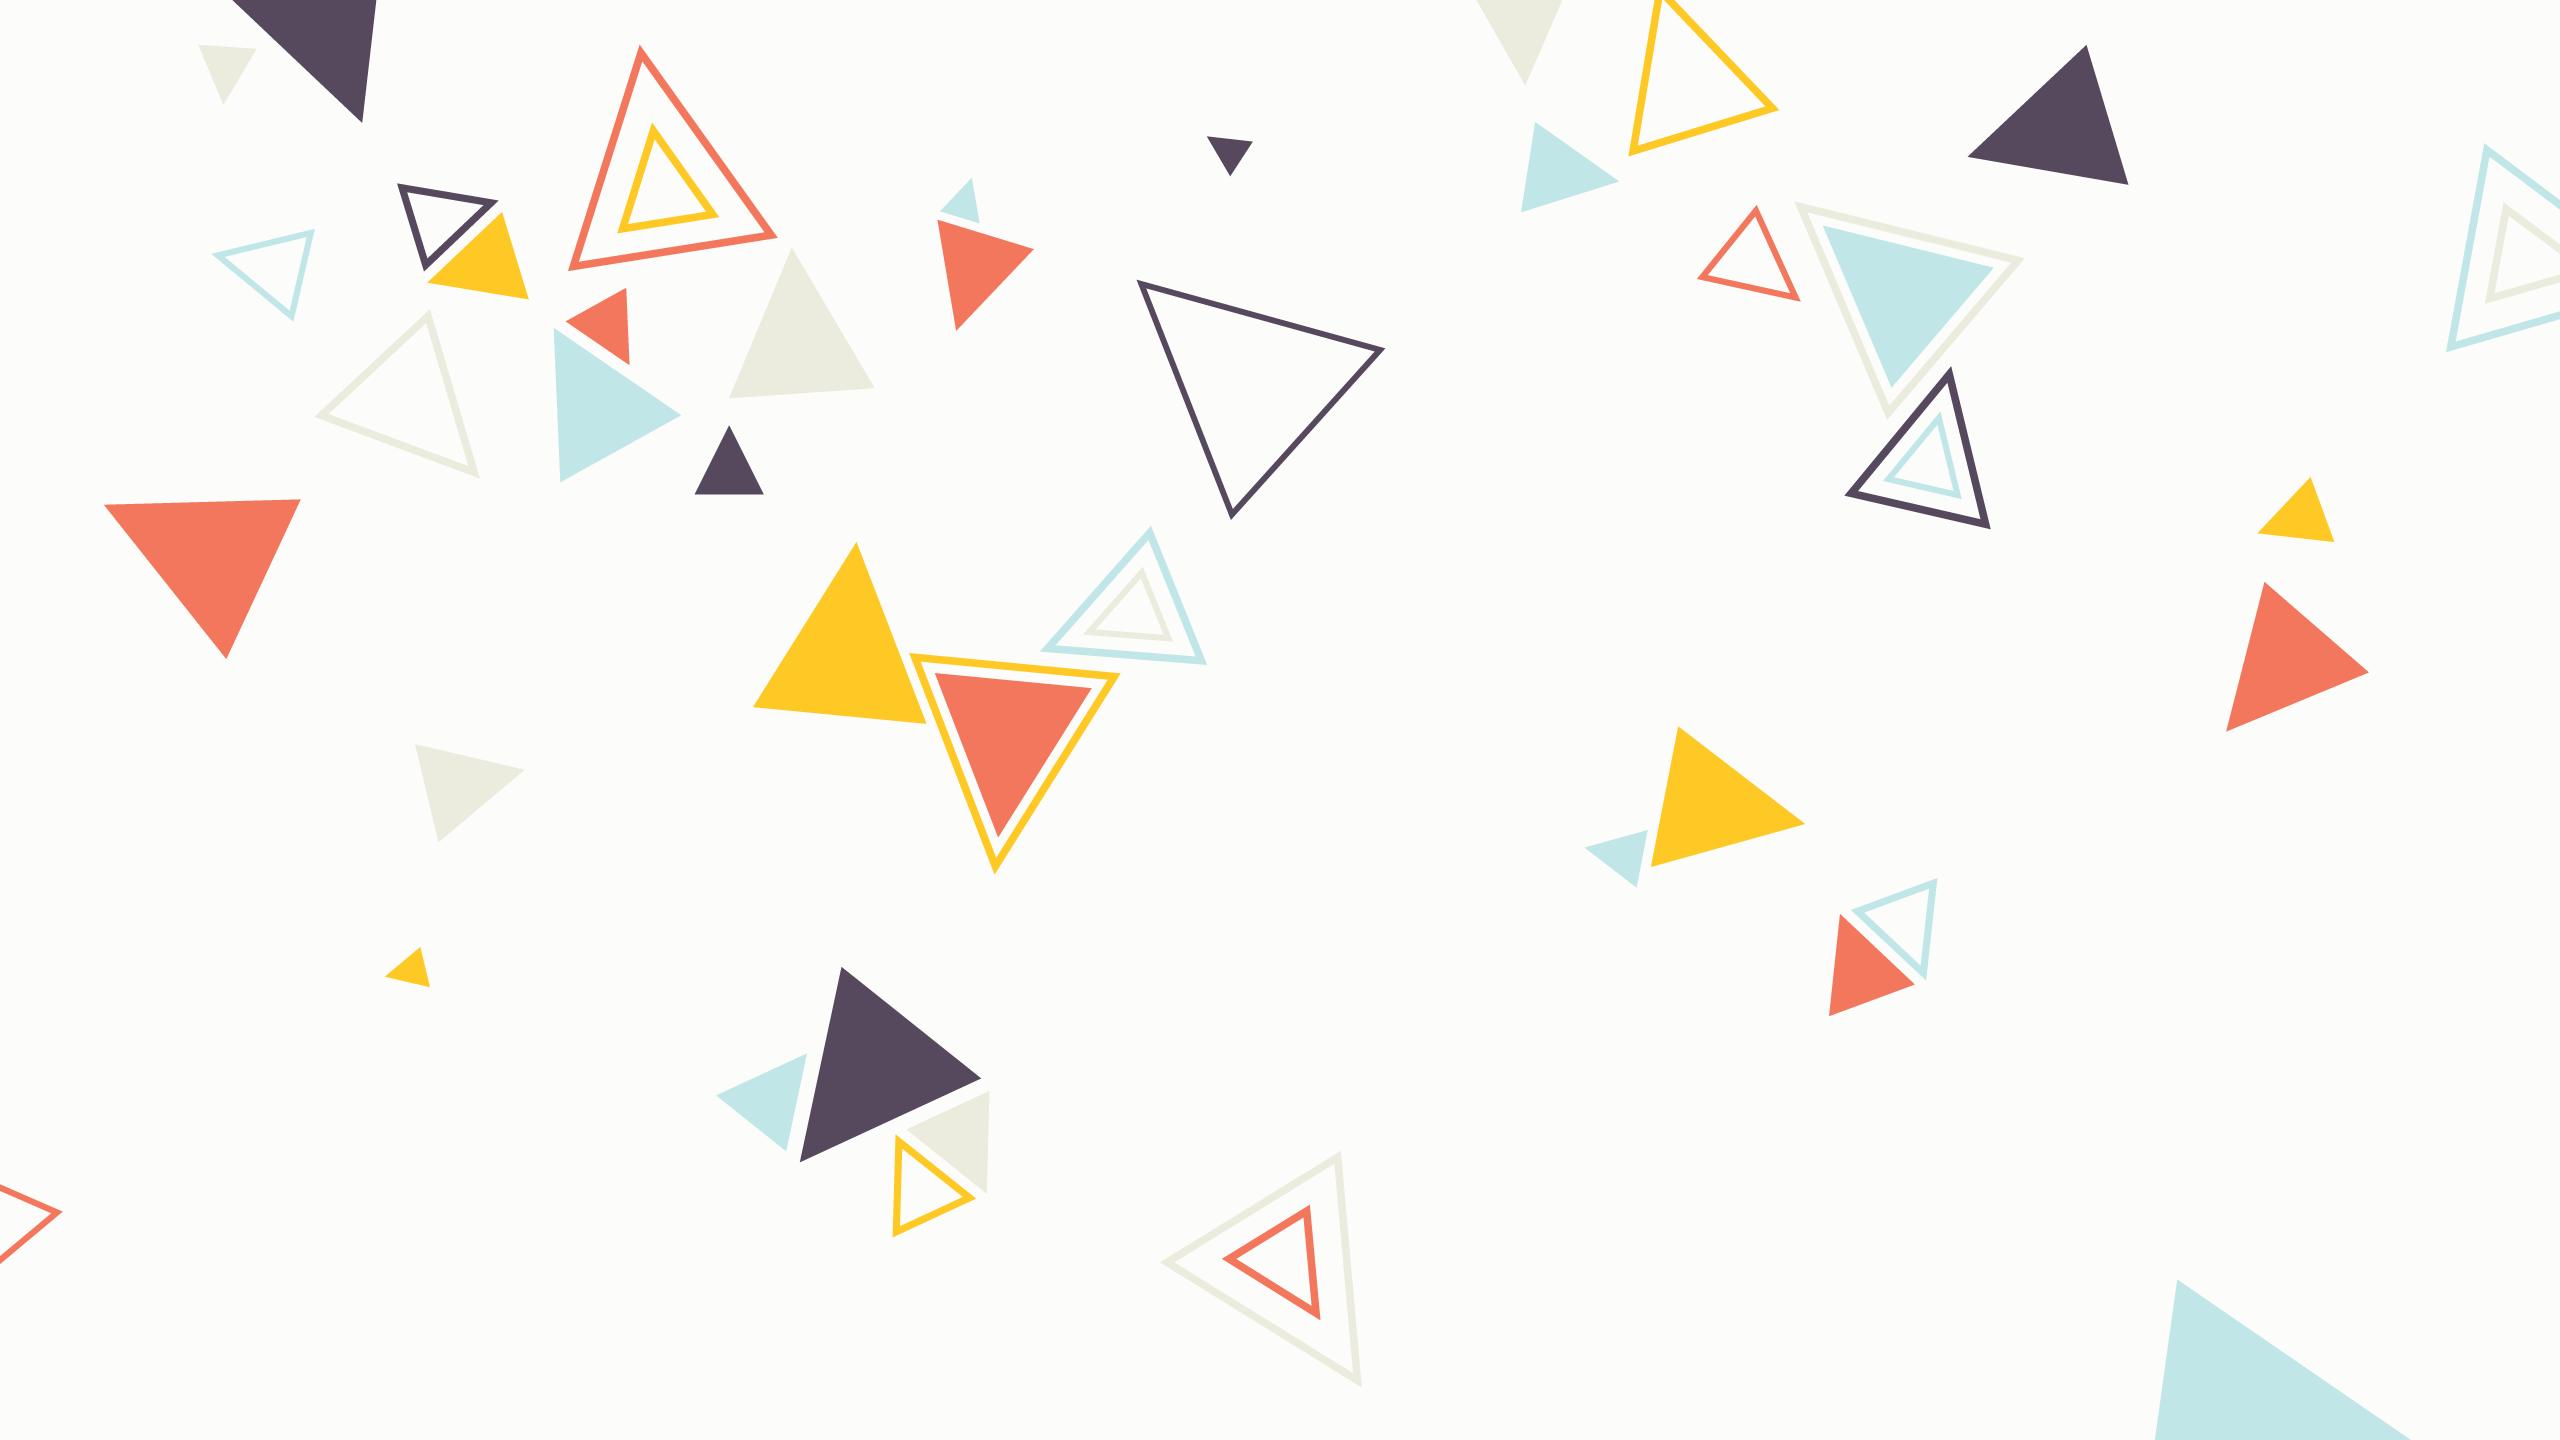 Png Tumblr Arrow Pattern Desktop Wallpaper Wwwmiifotoscom